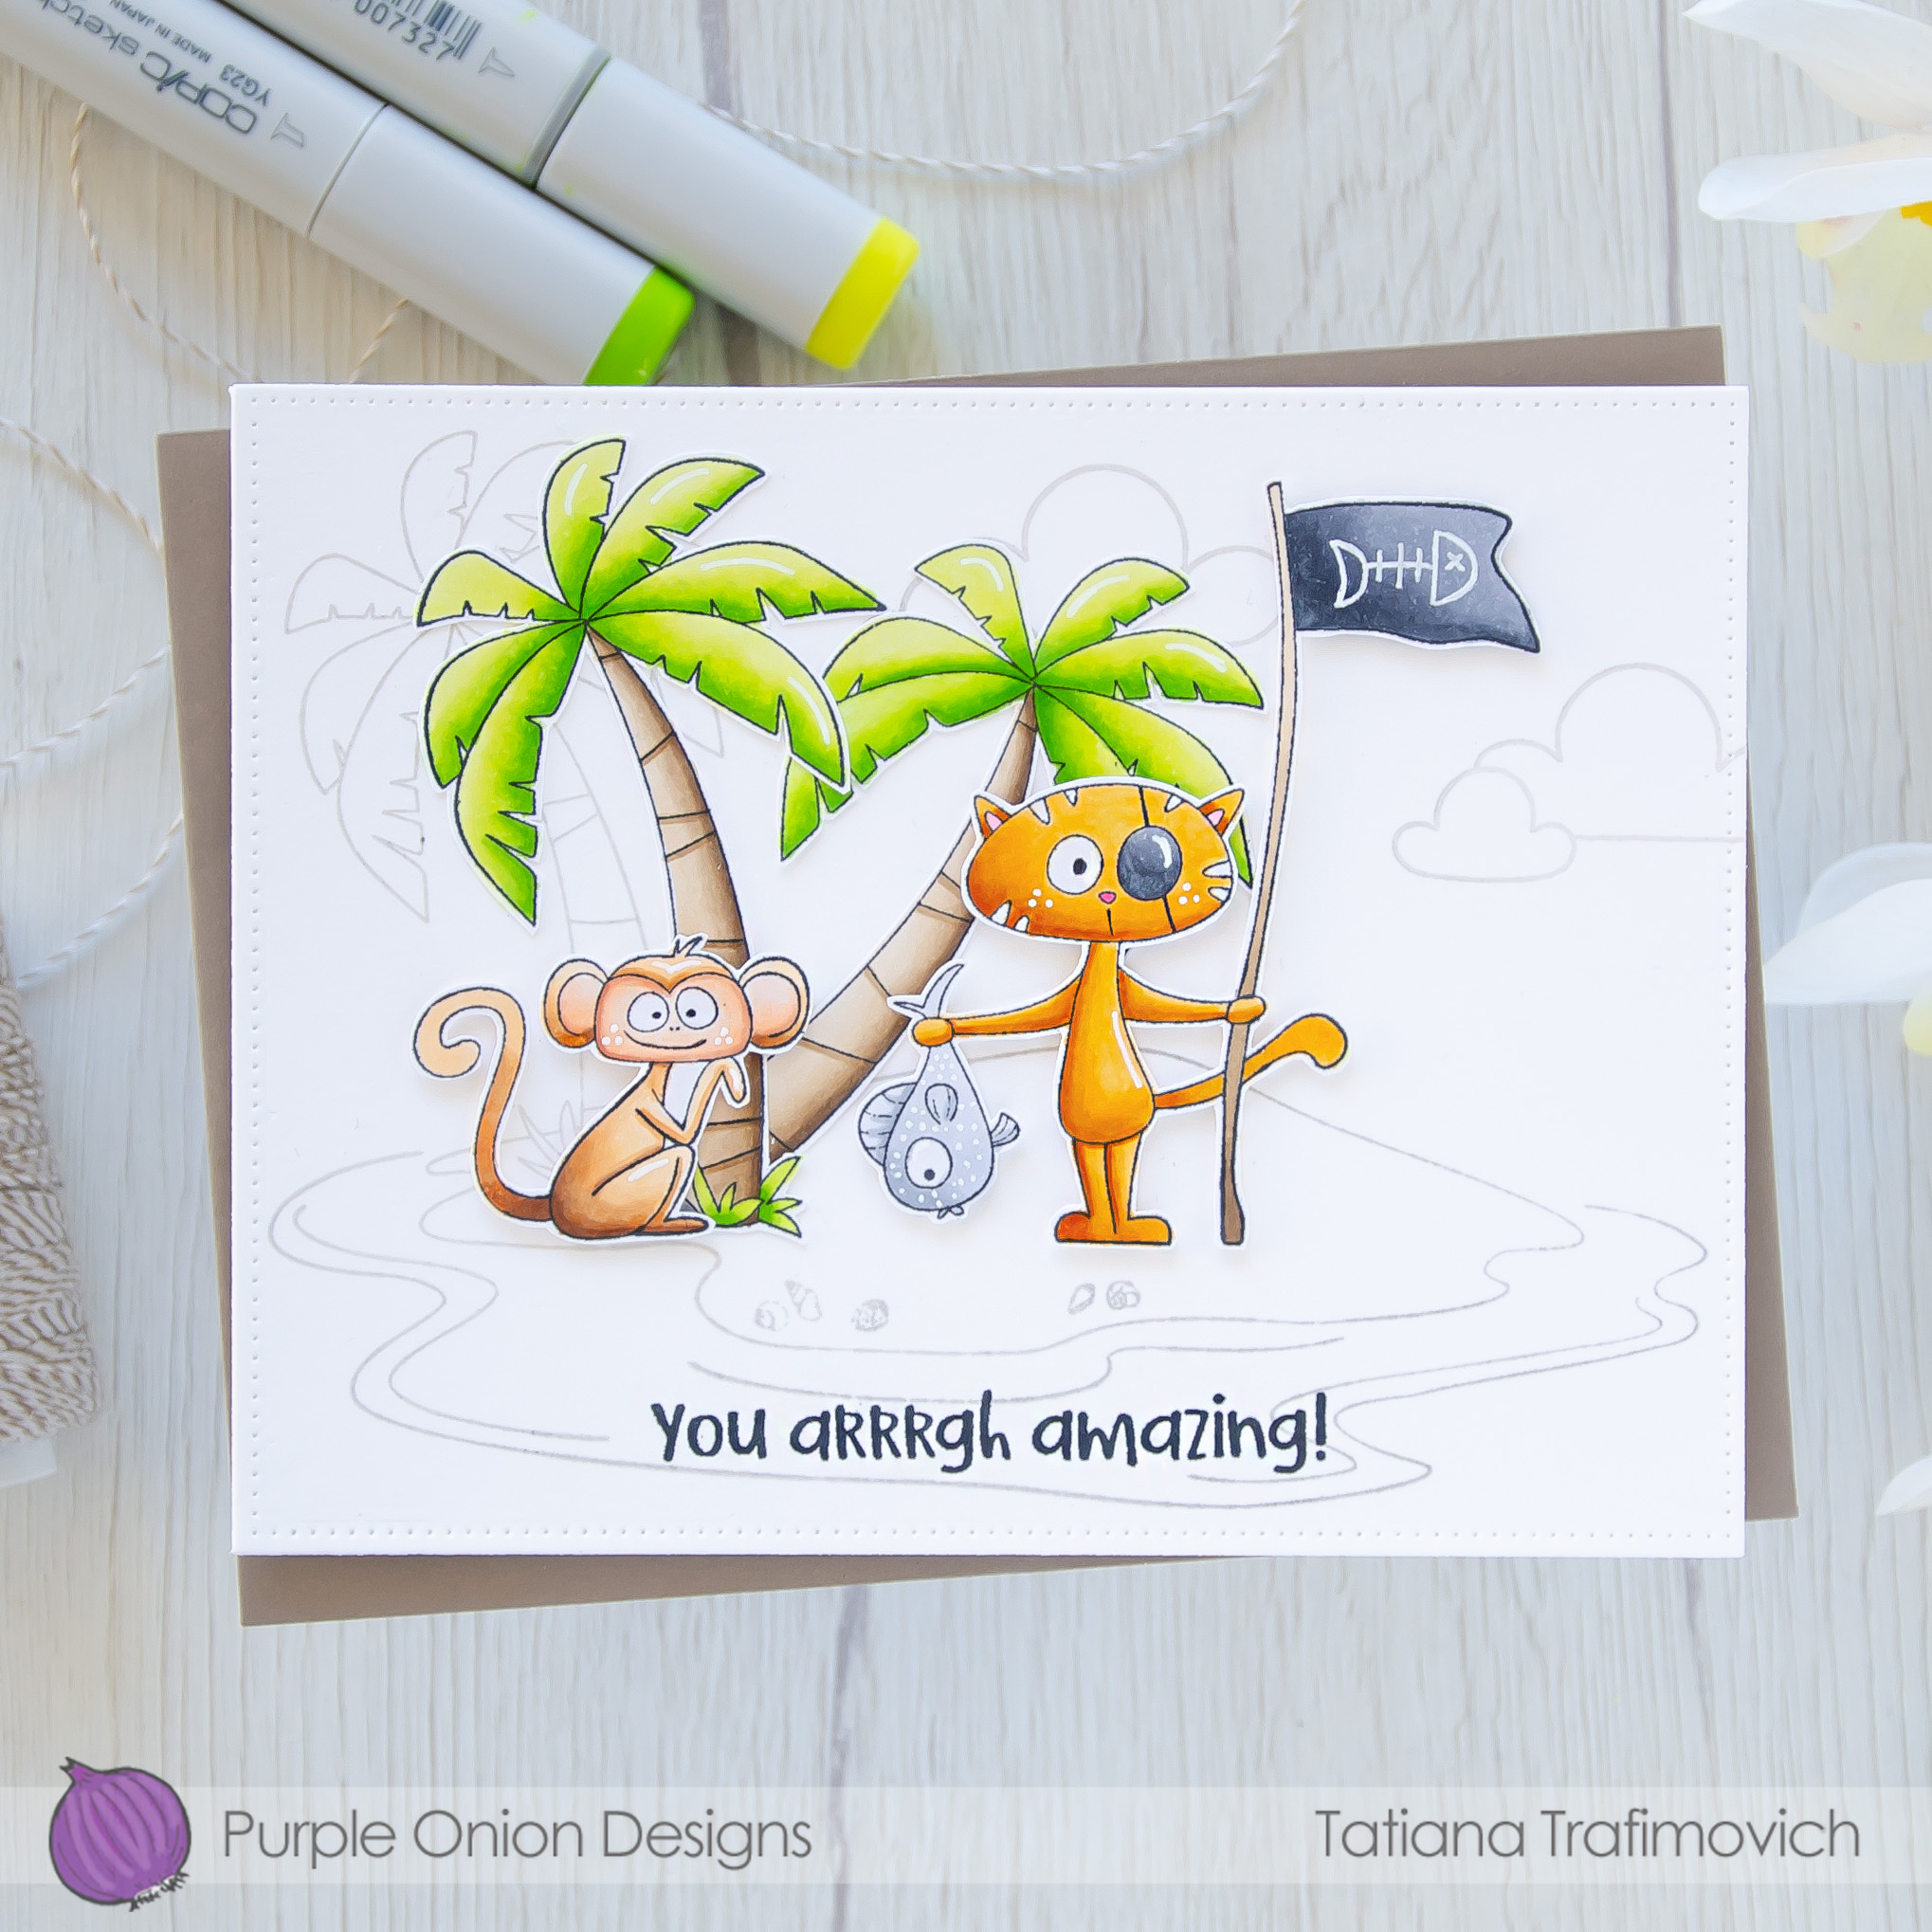 You Arrrgh Amazing! #handmade card by Tatiana Trafimovich #tatianacraftandart - stamps by Purple Onion Designs